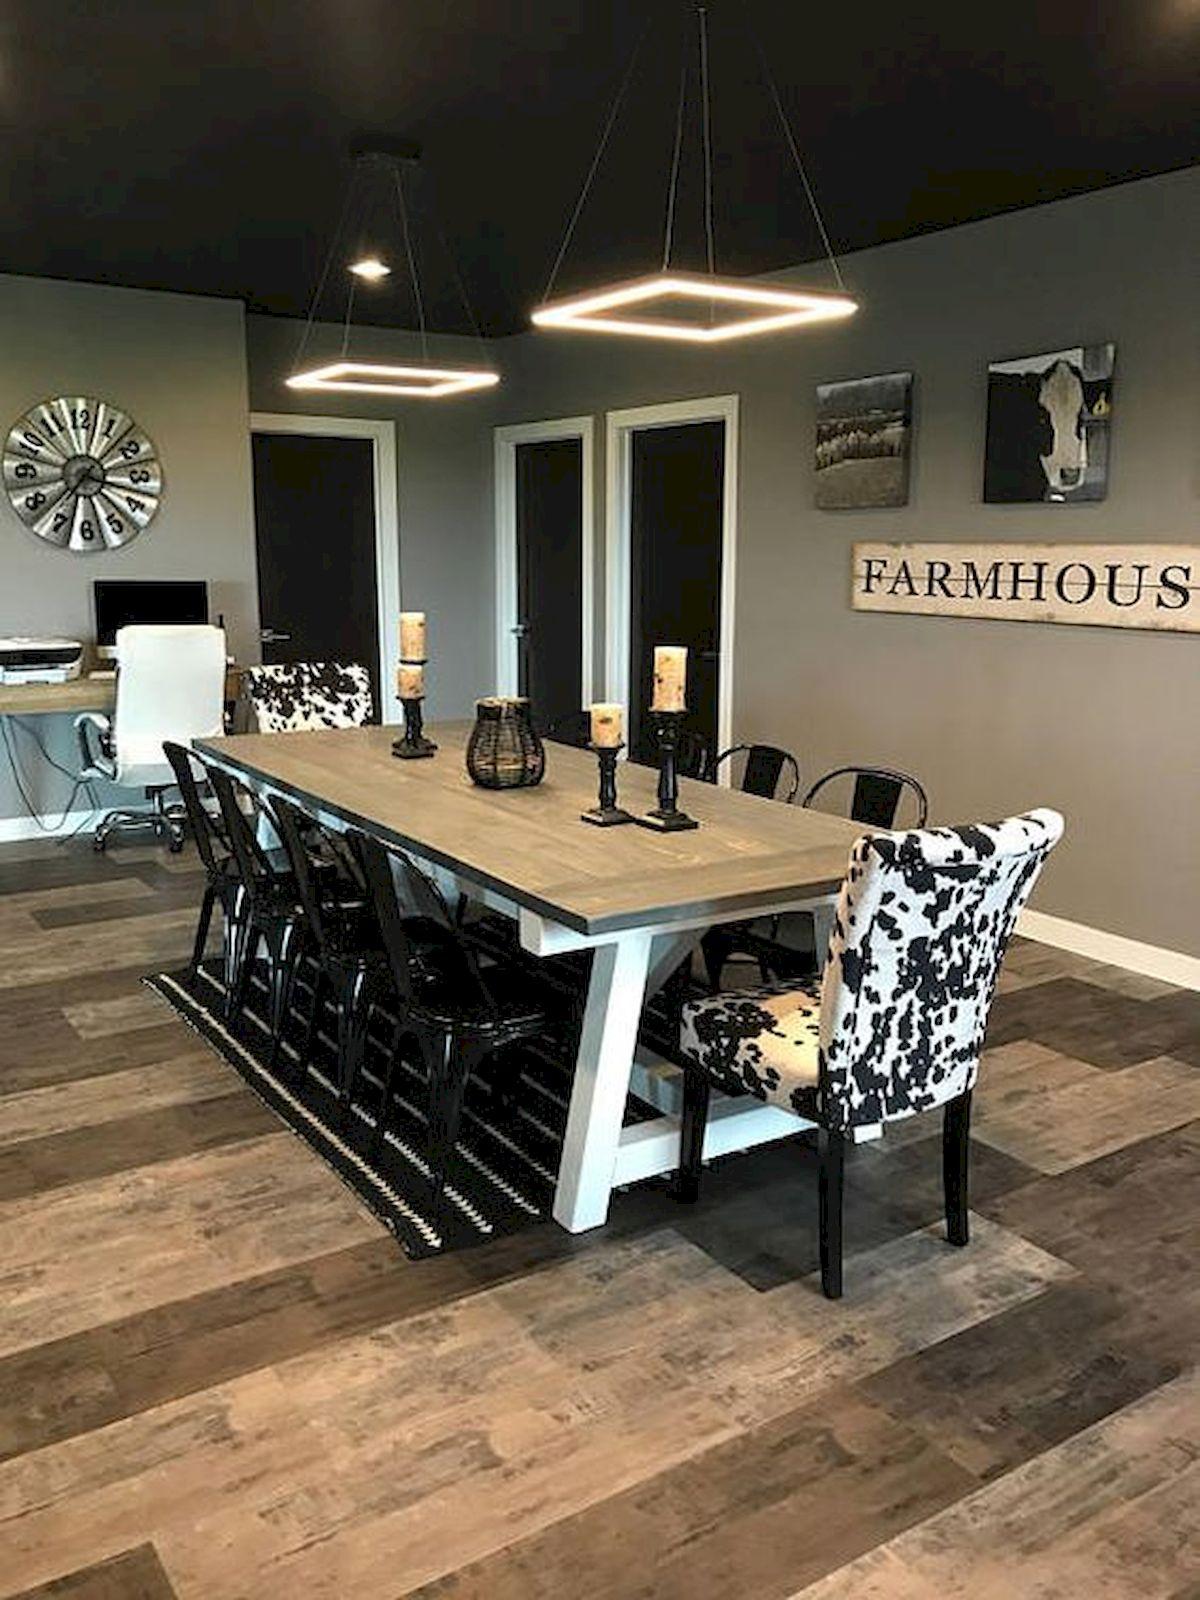 40 Adorable Farmhouse Dining Room Design And Decor Ideas (2)